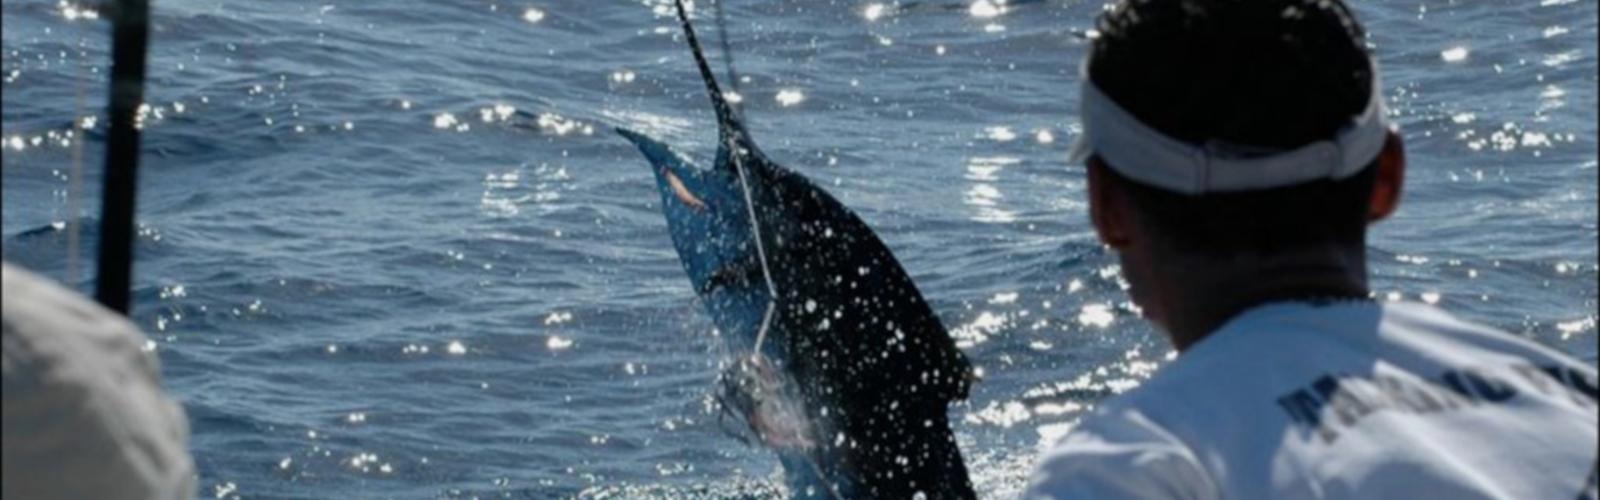 Tamarindo Fishing - Native's Way Costa Rica - Tamarindo Transfers and Tours